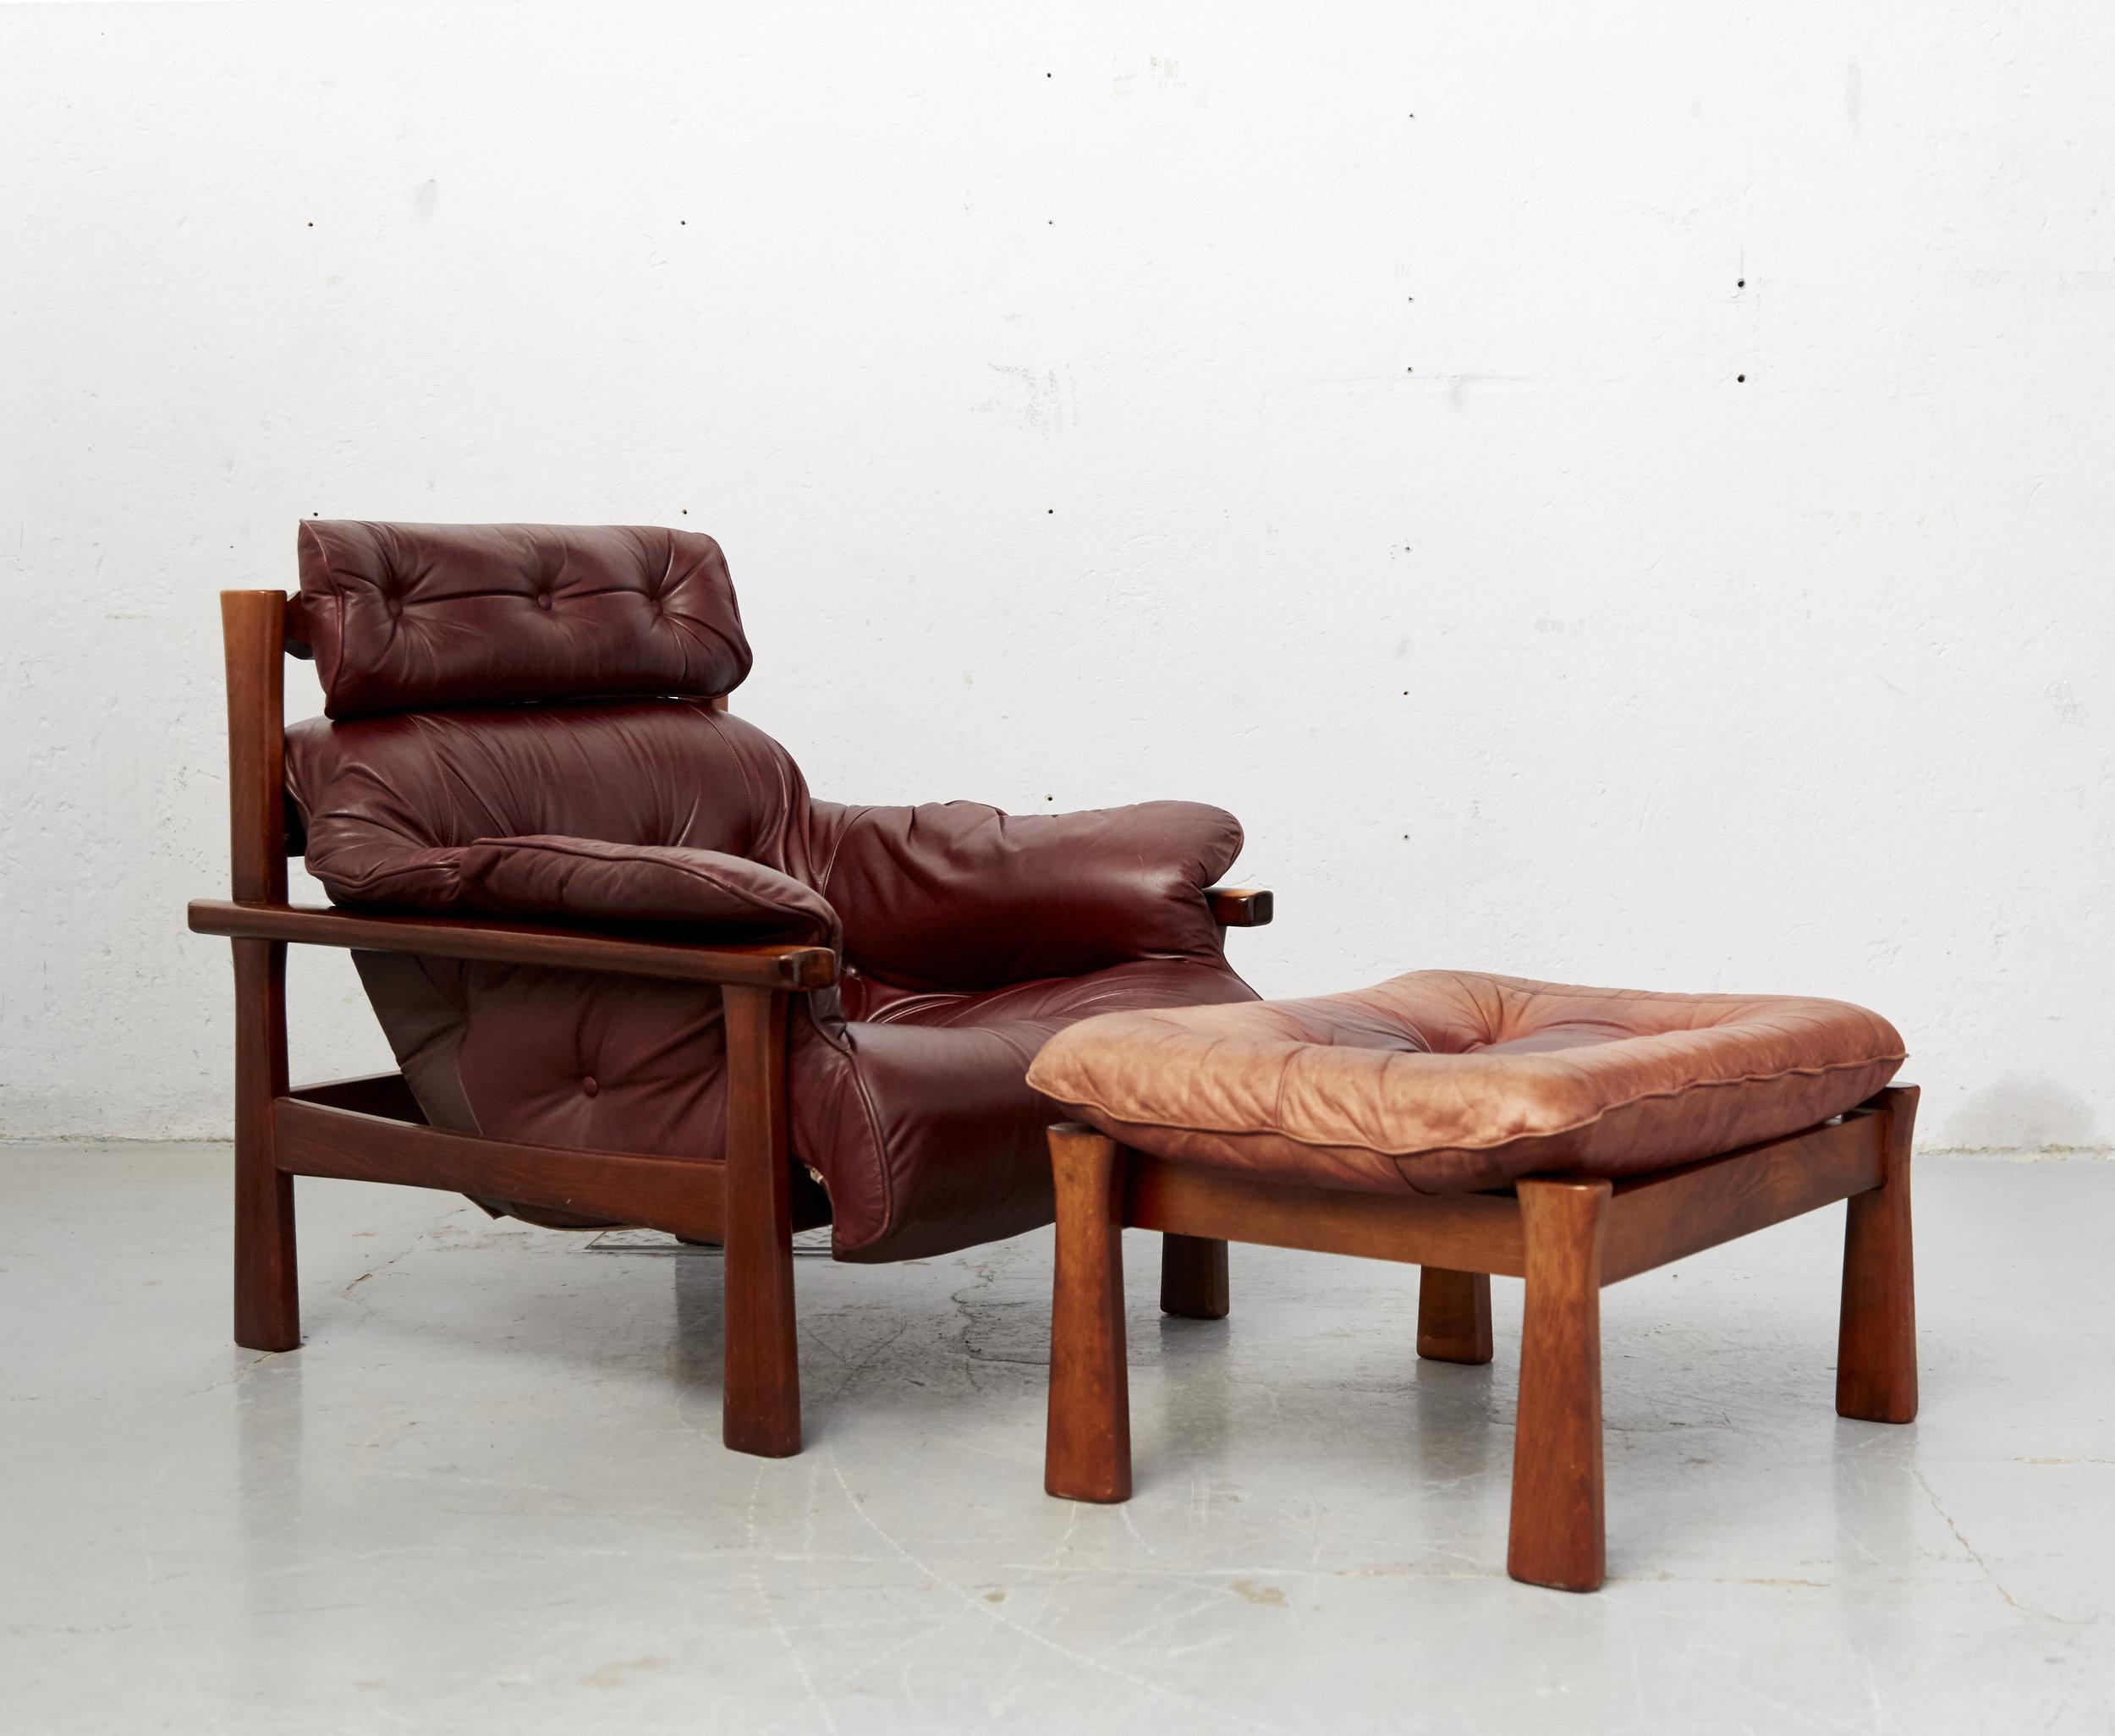 sessel plus ottomane von percival lafer fr lafer furniture company - Bergroer Sessel Und Ottomane